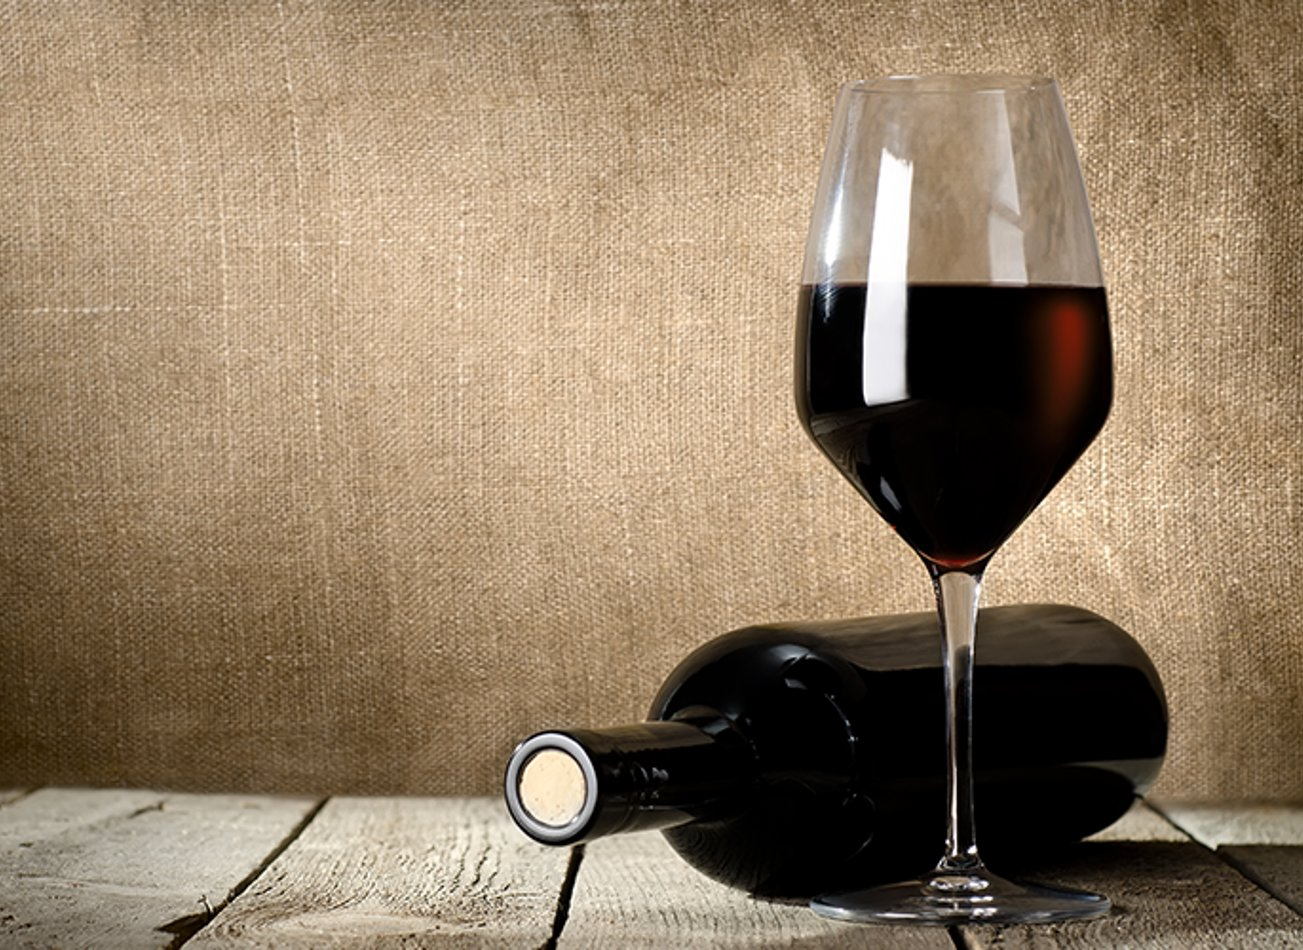 dégustation de vins vin milan activites vimigo